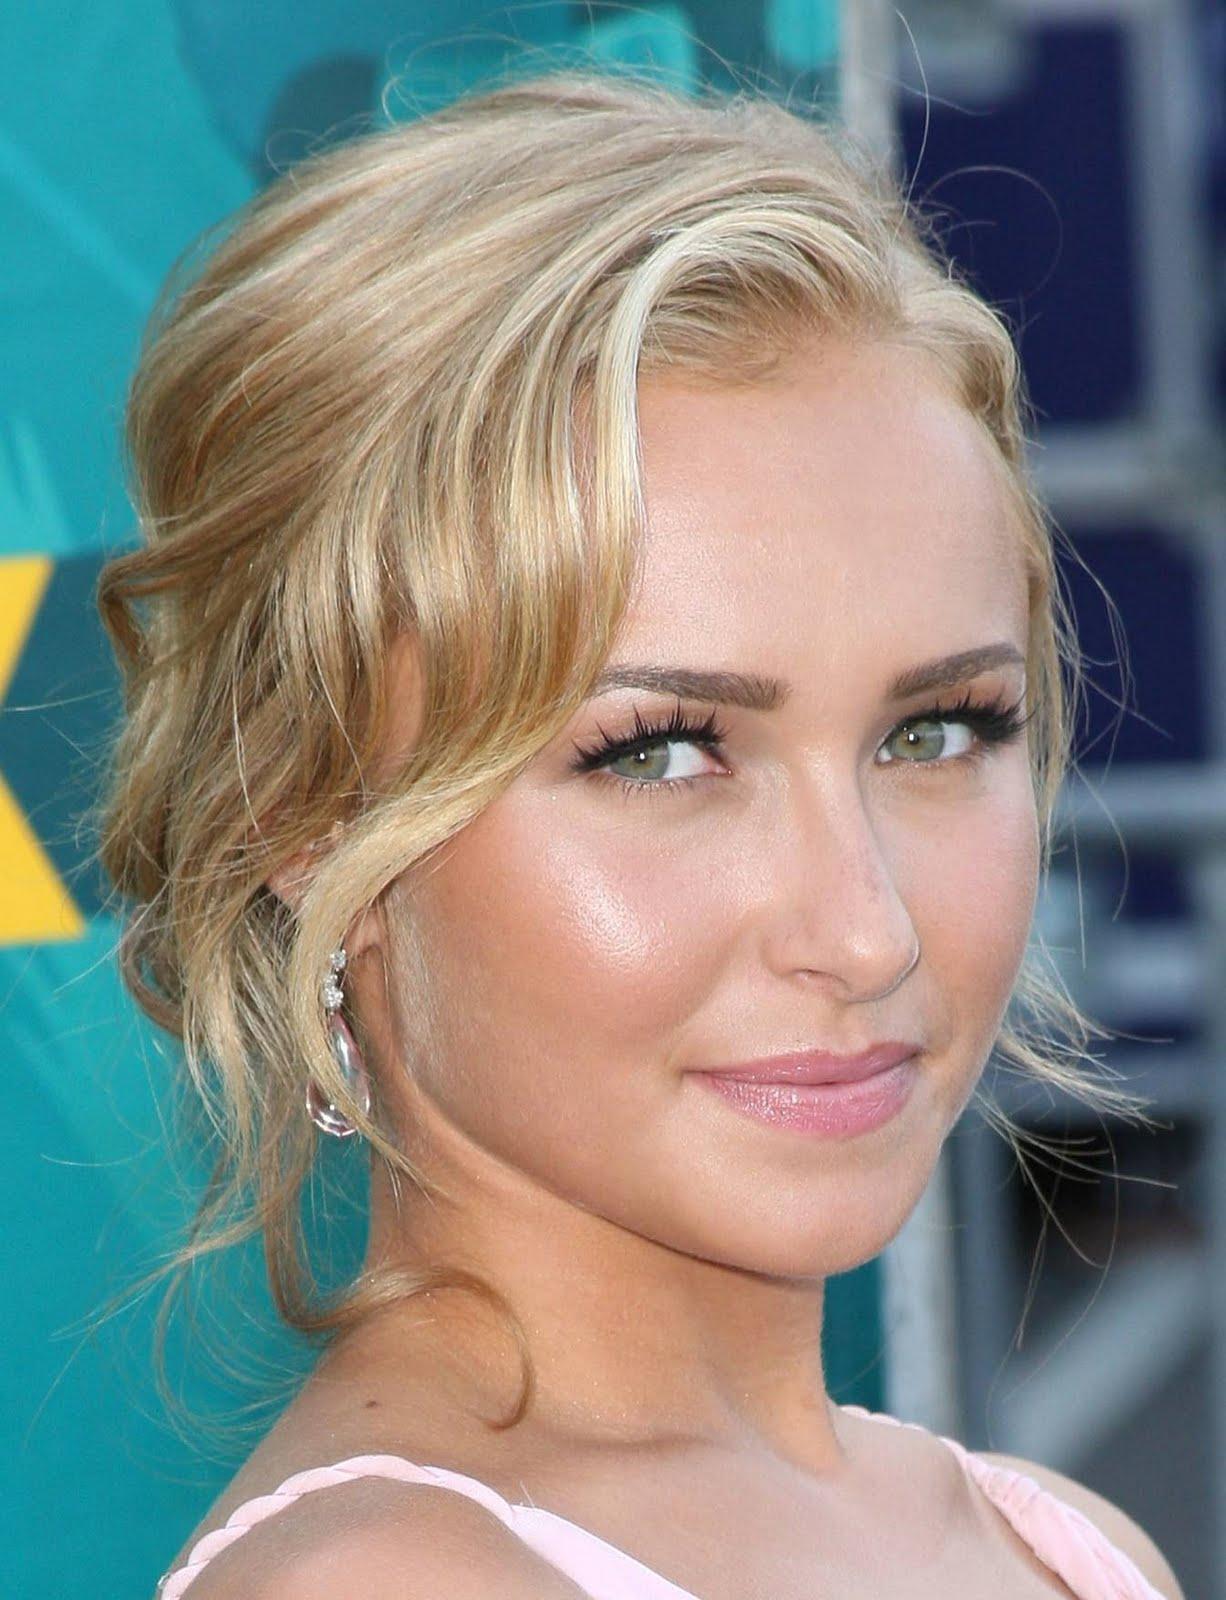 Astounding Kafgallery Celebrities Natural Blonde Hairstyles 2012 Short Hairstyles For Black Women Fulllsitofus